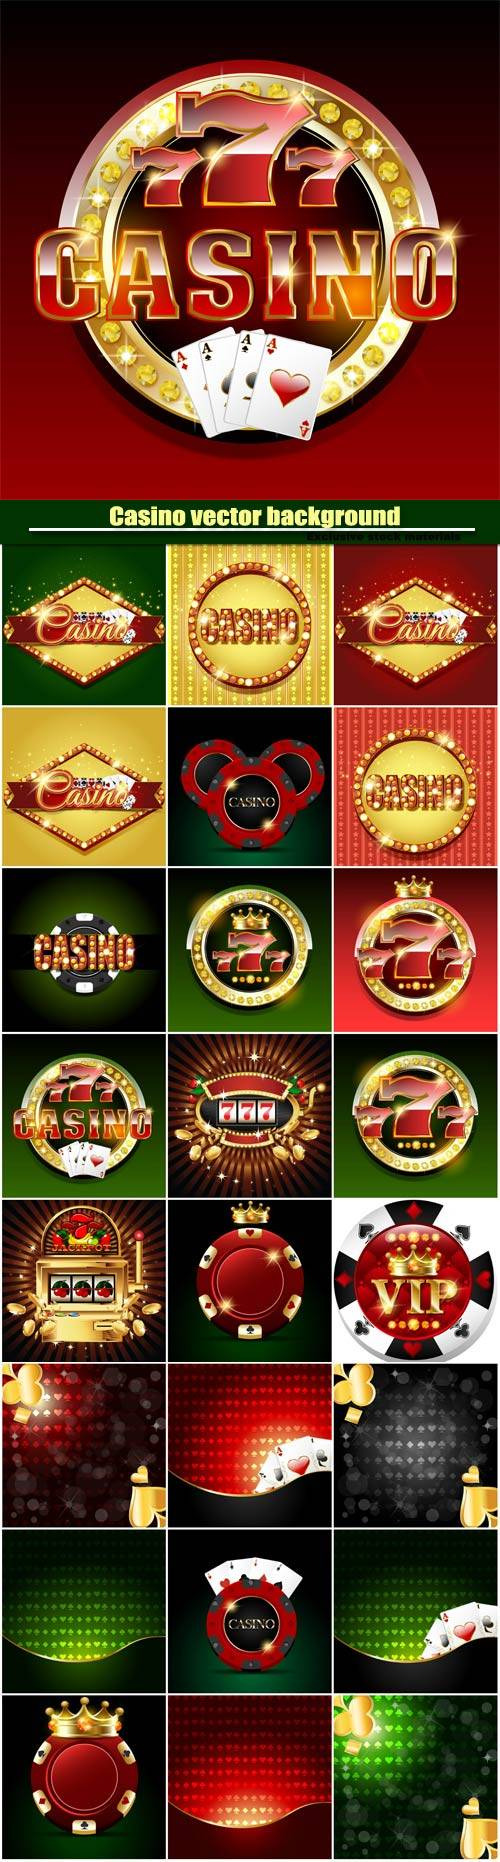 Casino vector background, slot machine on shiny background